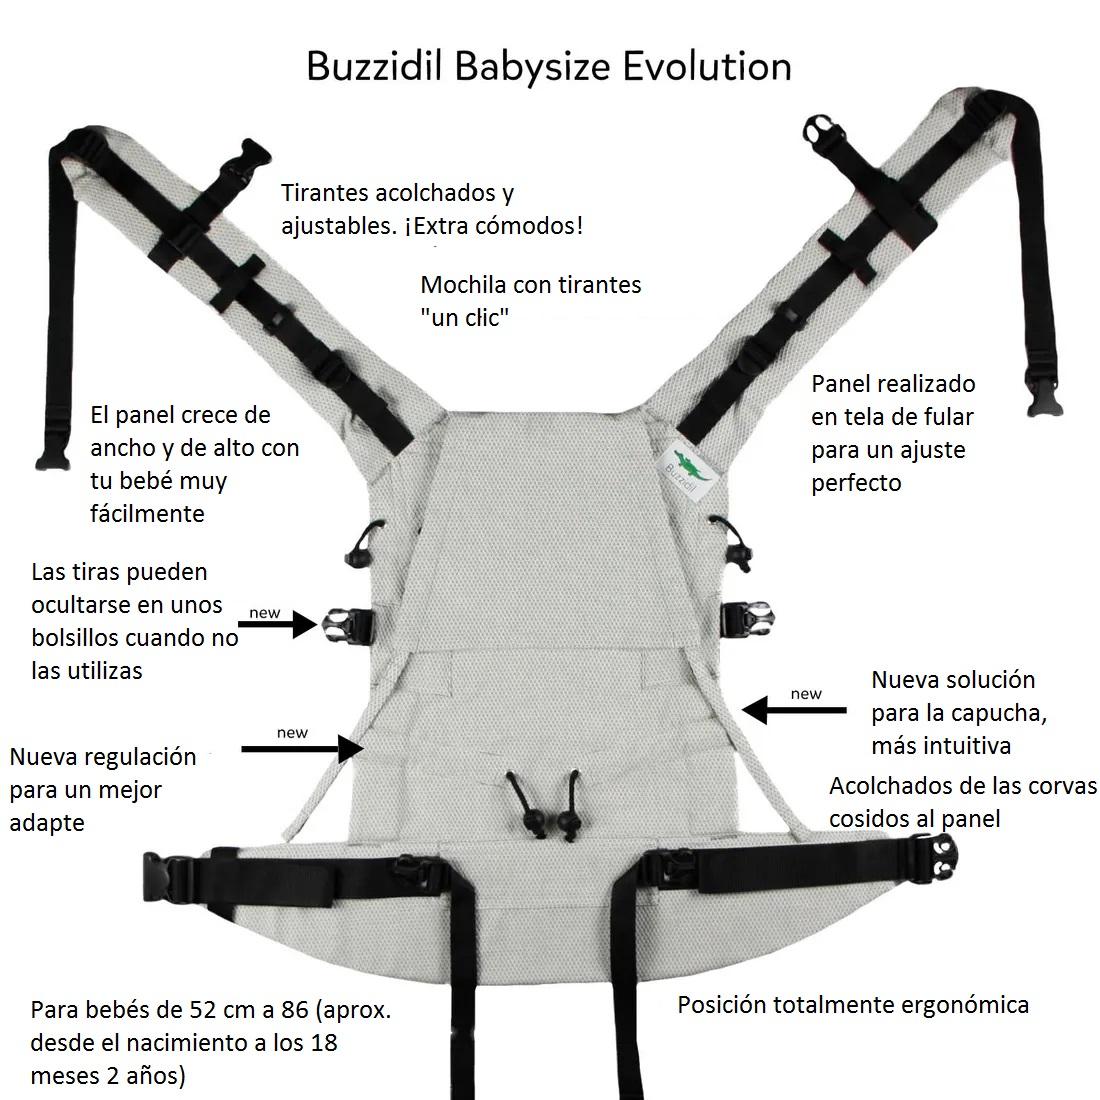 Mochila Buzzidil Evolution STANDARD FILIGREE FLUTTER